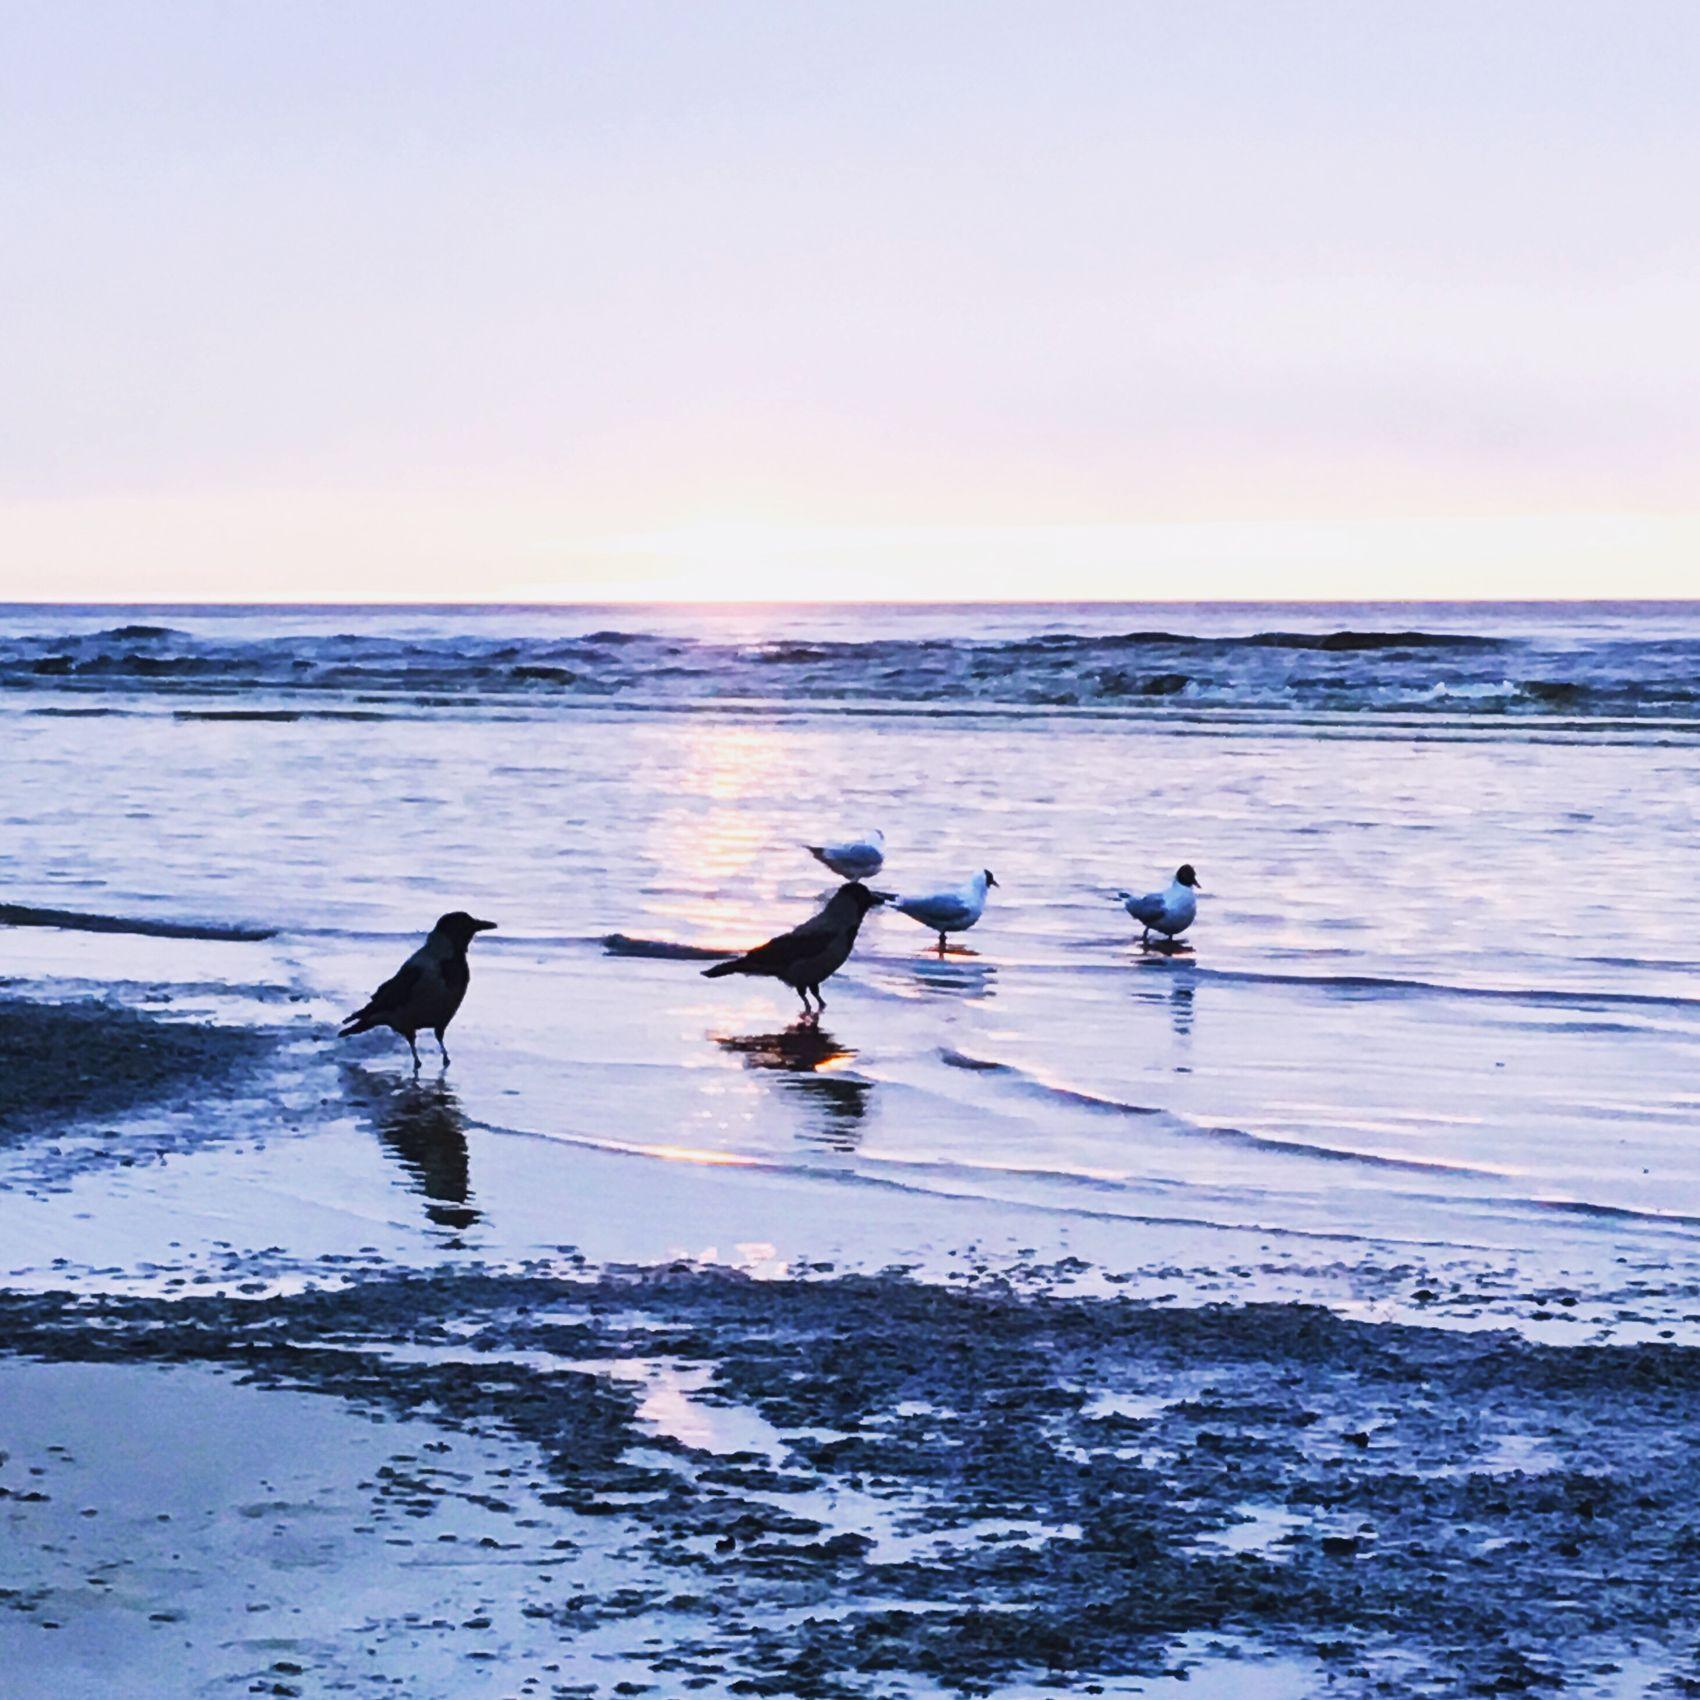 Latvia JurmalaBeach Sunset Sea Bird Water Nature Beauty In Nature Wave